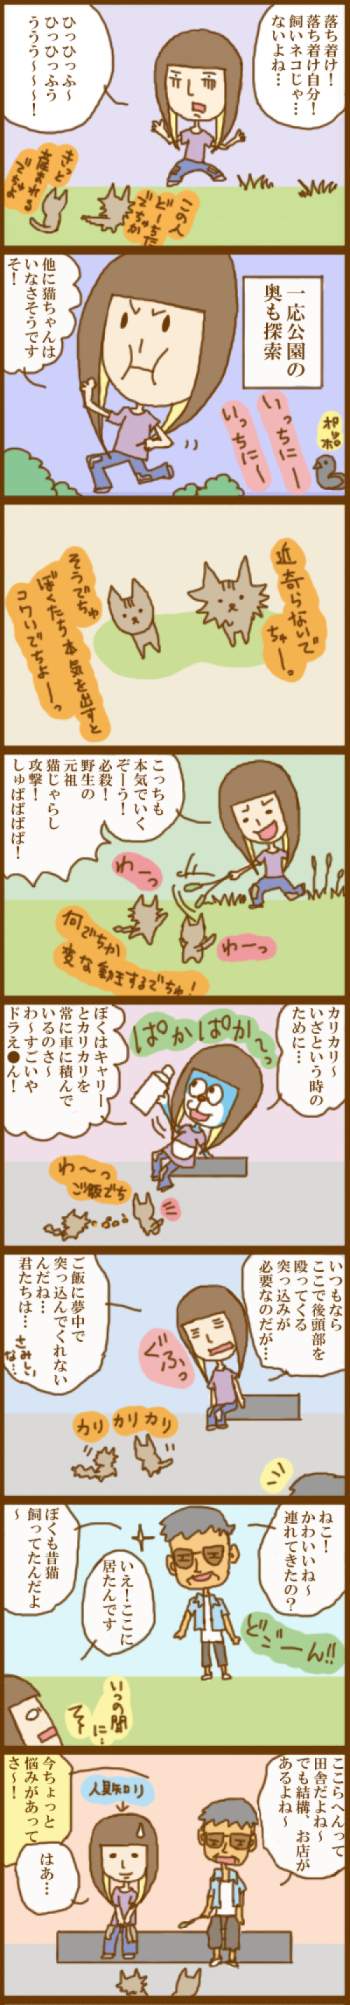 f:id:suzuokayu:20201120094833j:plain